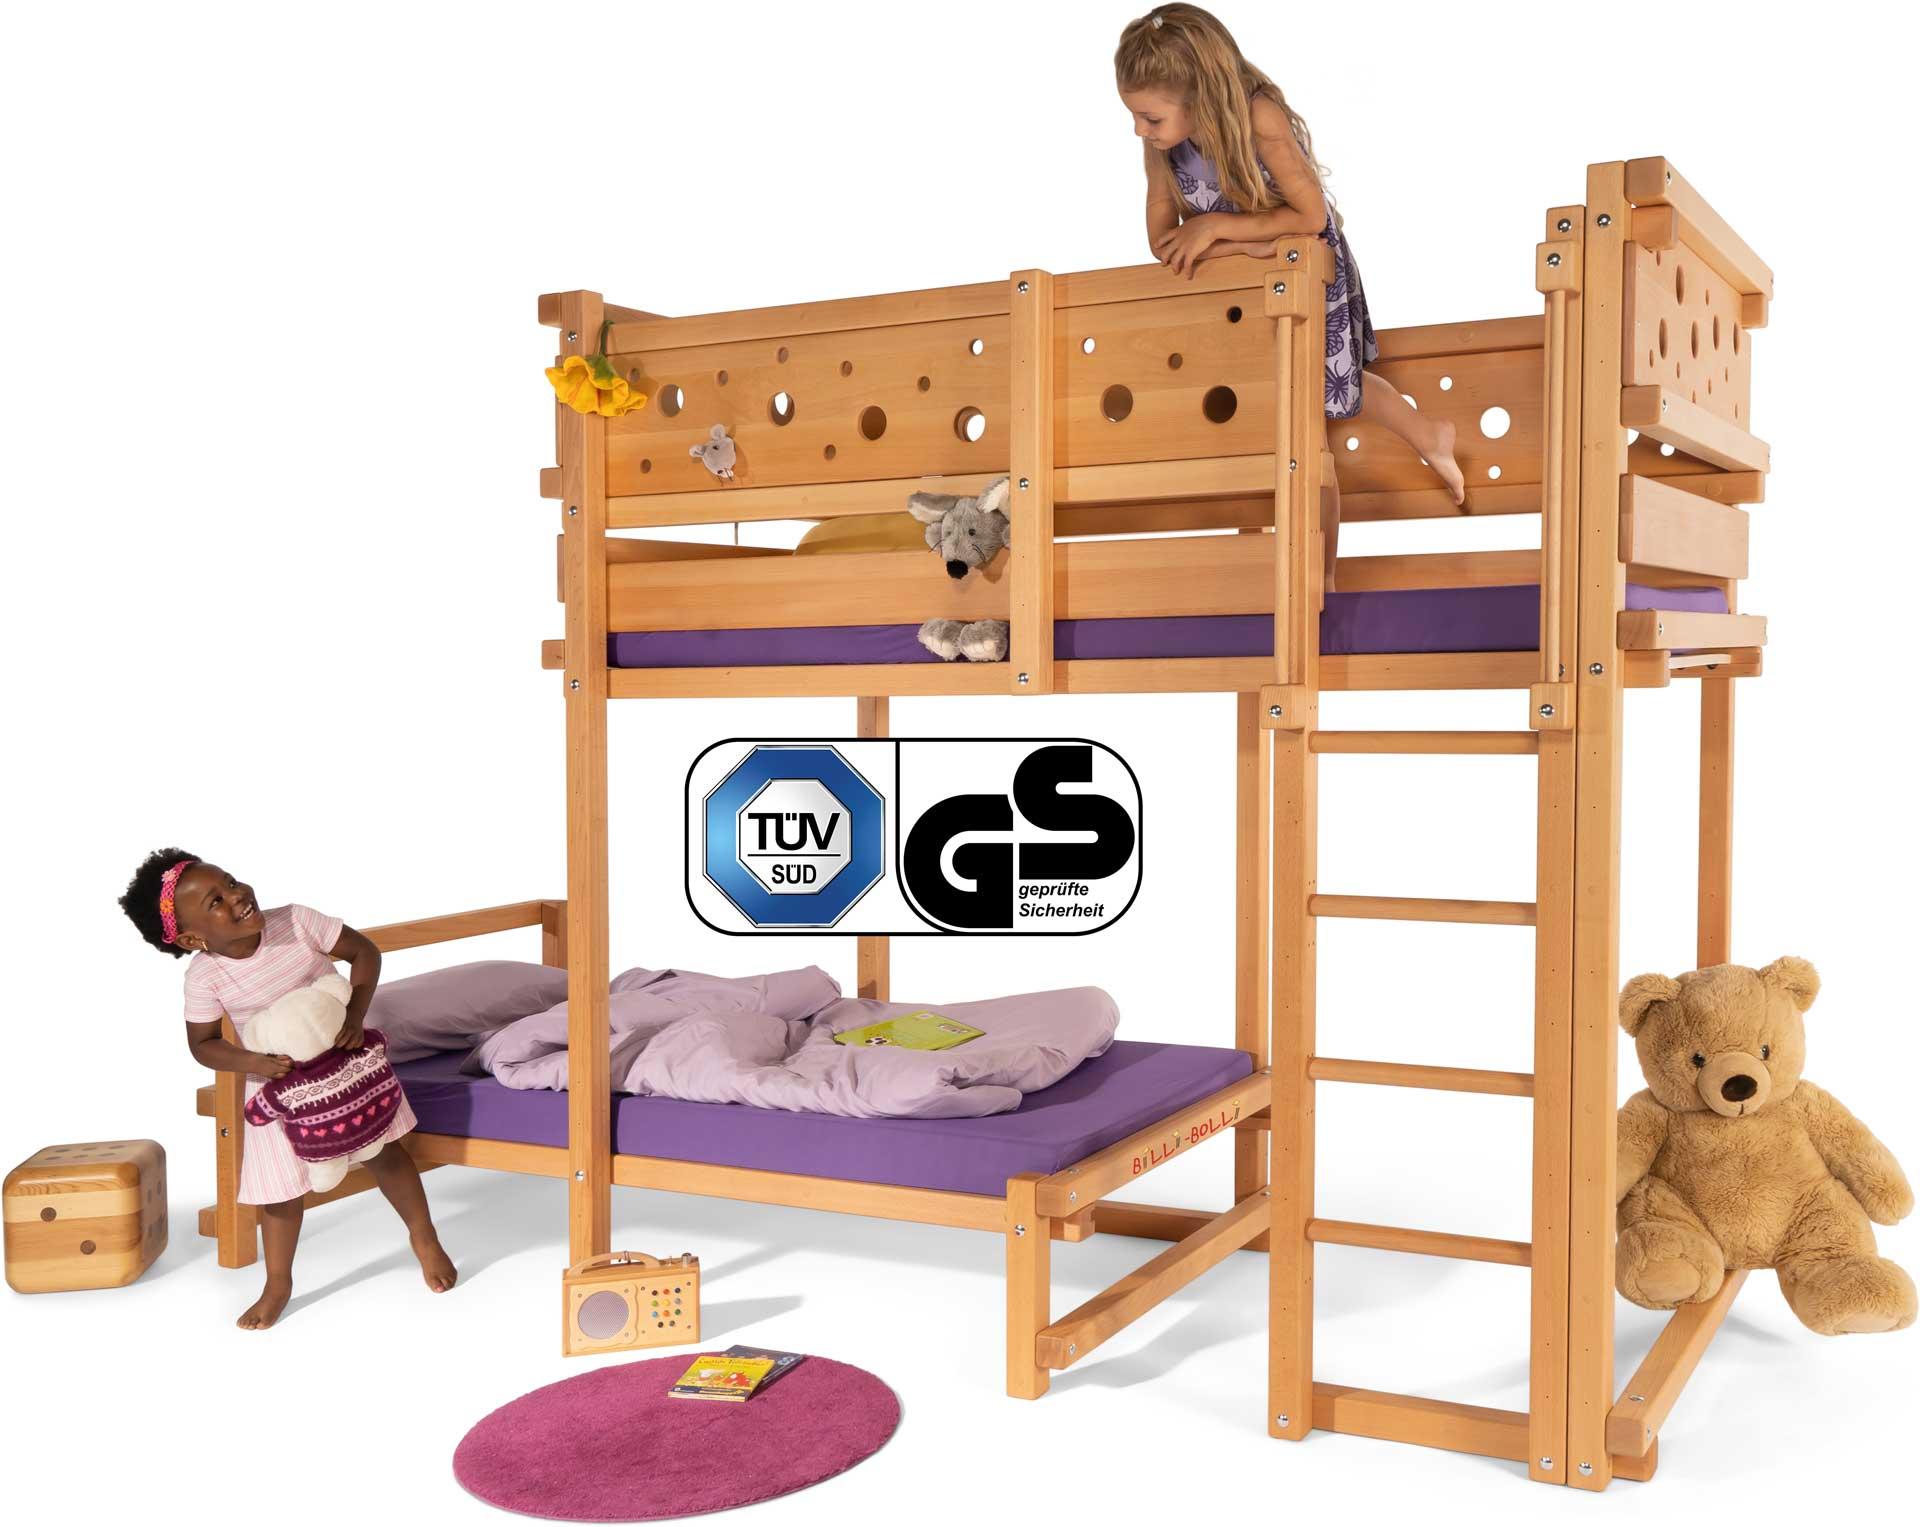 Full Size of Hochbetten Kinderzimmer Kinderbetten Regal Weiß Sofa Regale Kinderzimmer Hochbetten Kinderzimmer